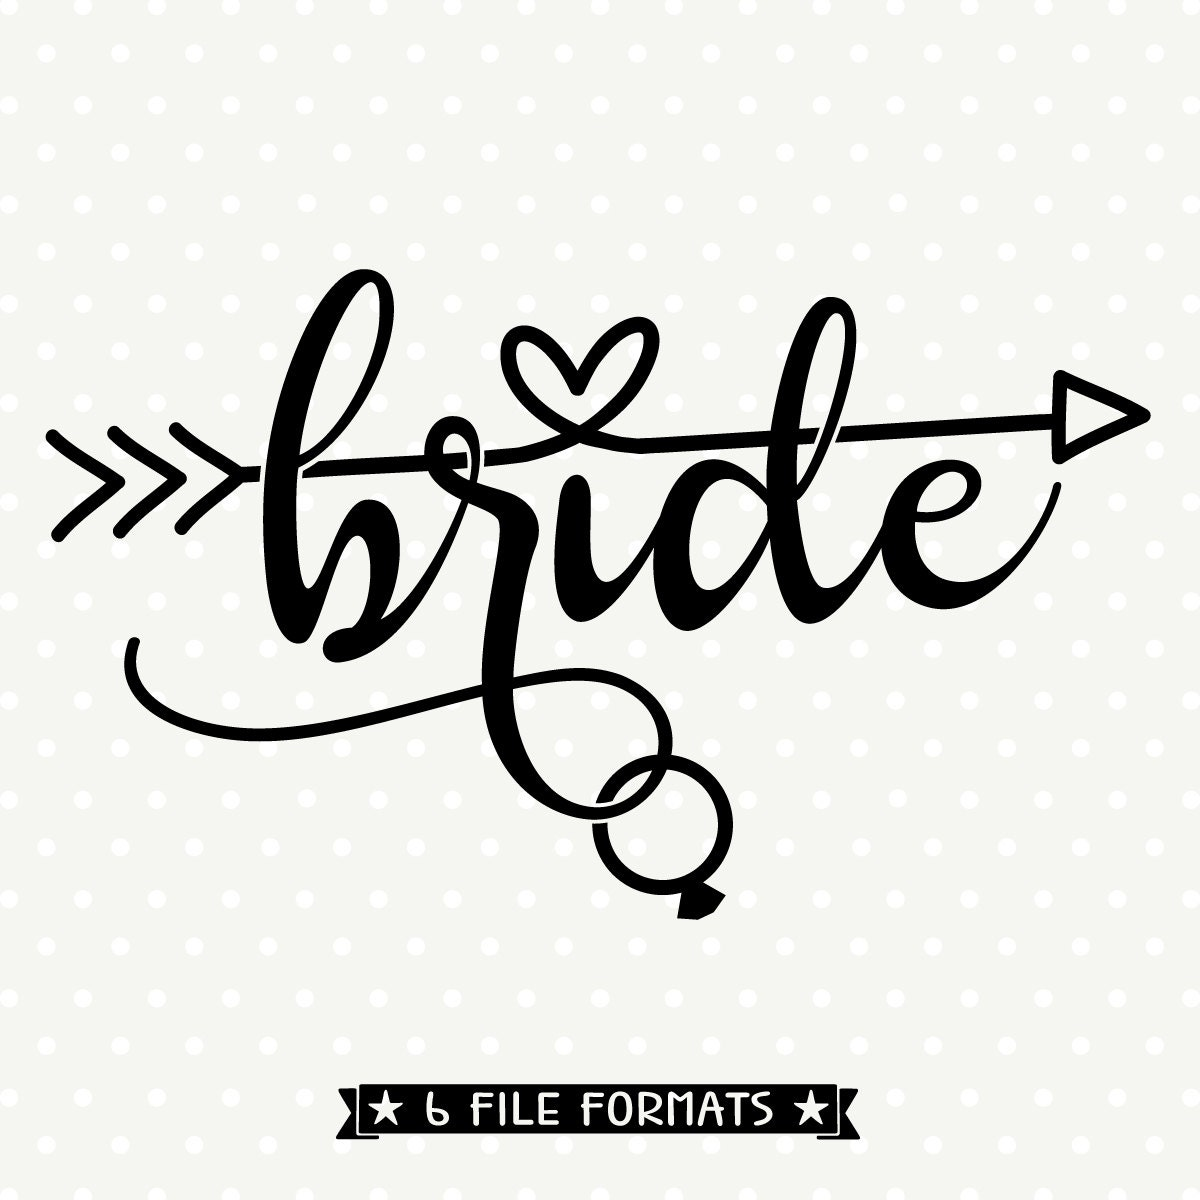 Bride Dxf File Diy Bridal Party Shirt Wedding Svg File Dxf